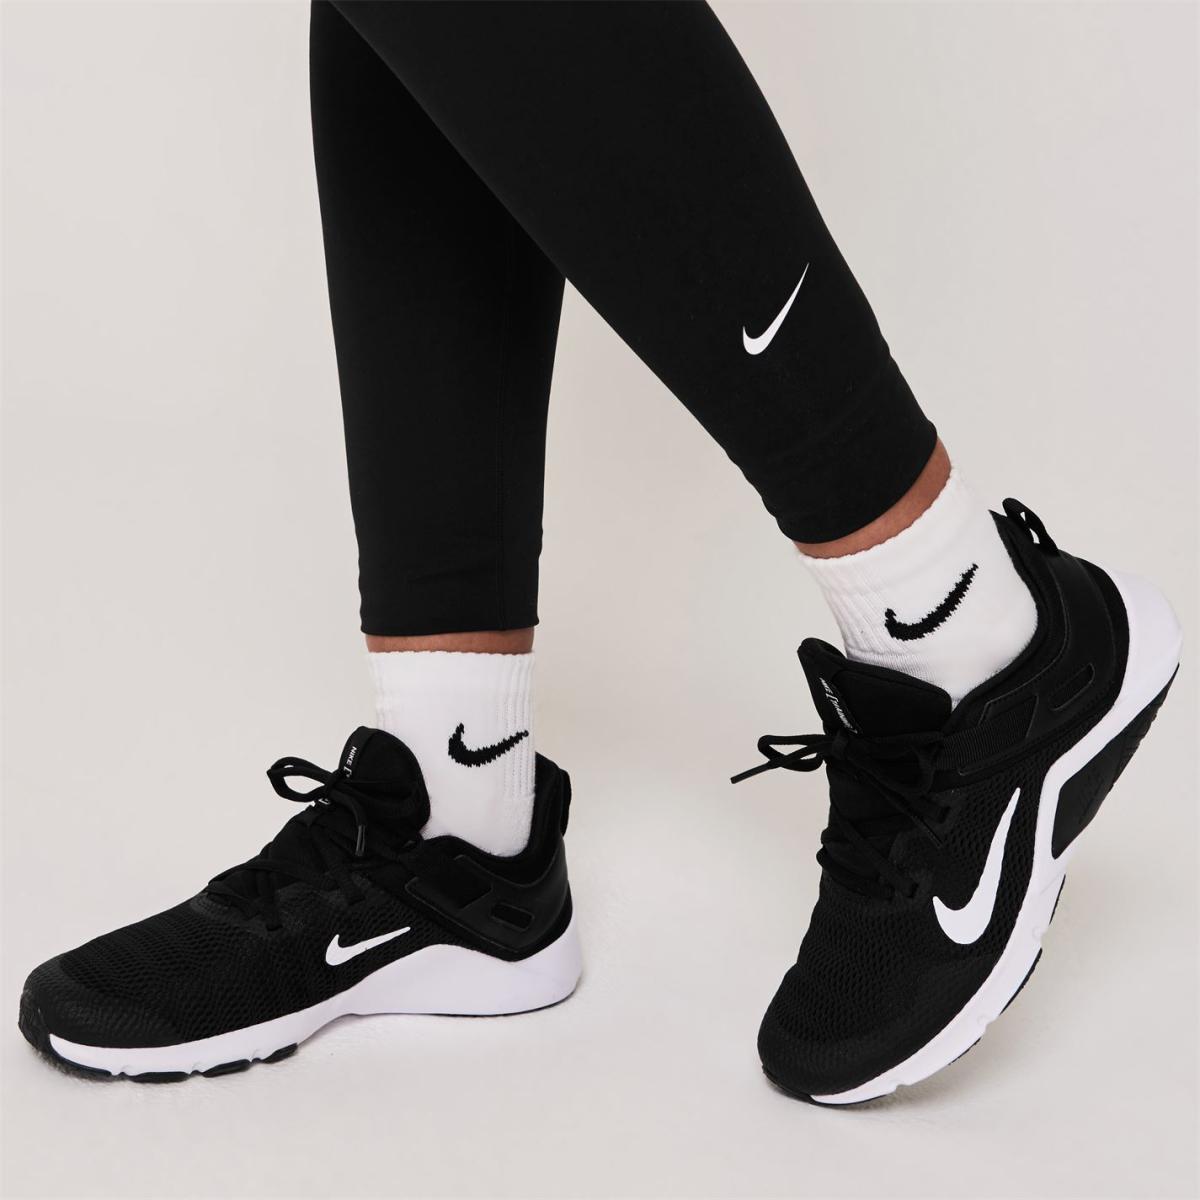 Nike Legend Turnschuhe Damen Sneaker Sportschuhe Laufschuhe 3006